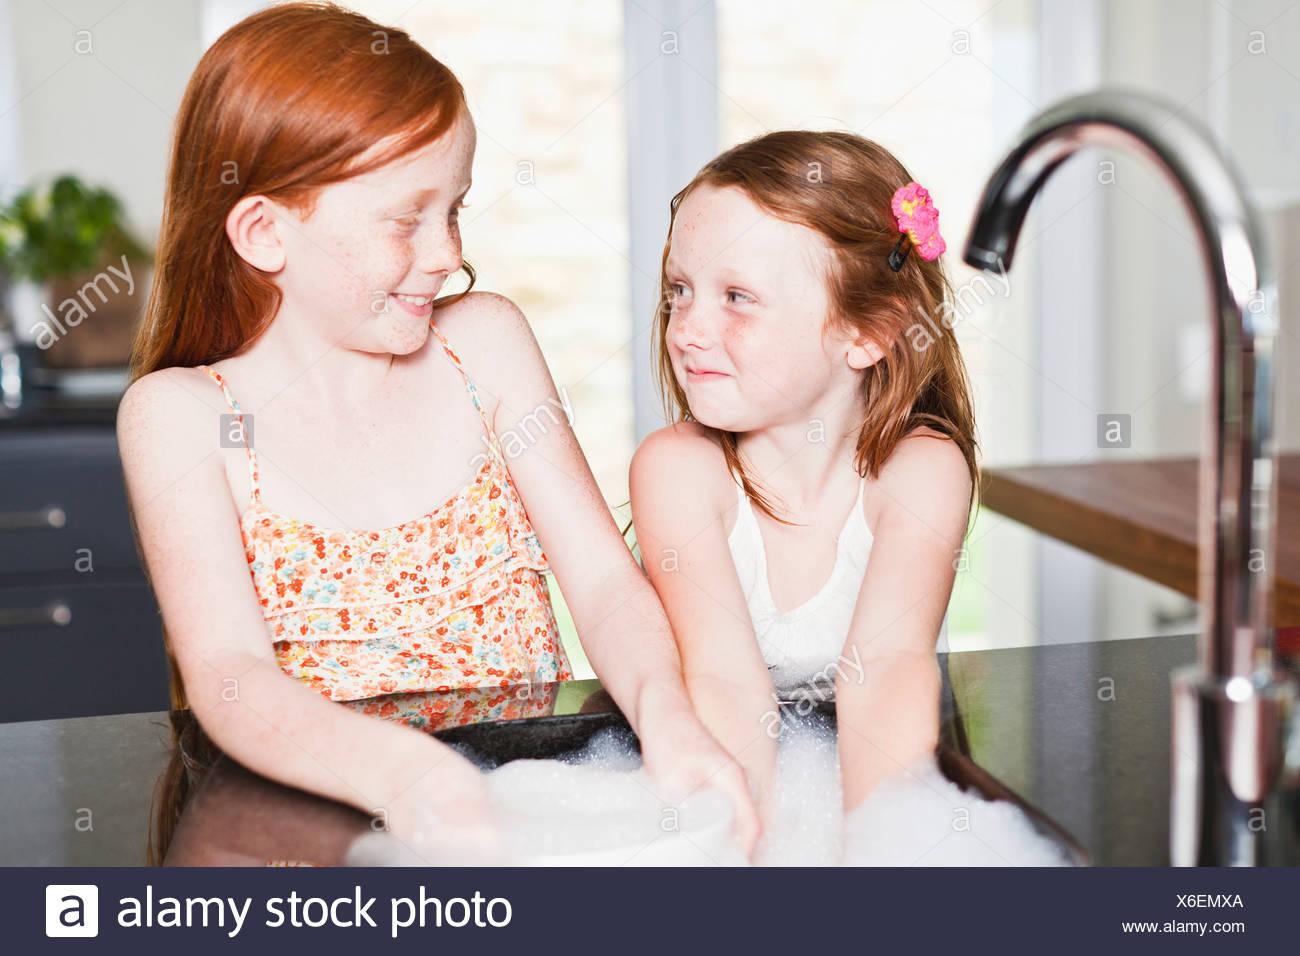 Smiling girls washing dishes in sink - Stock Image